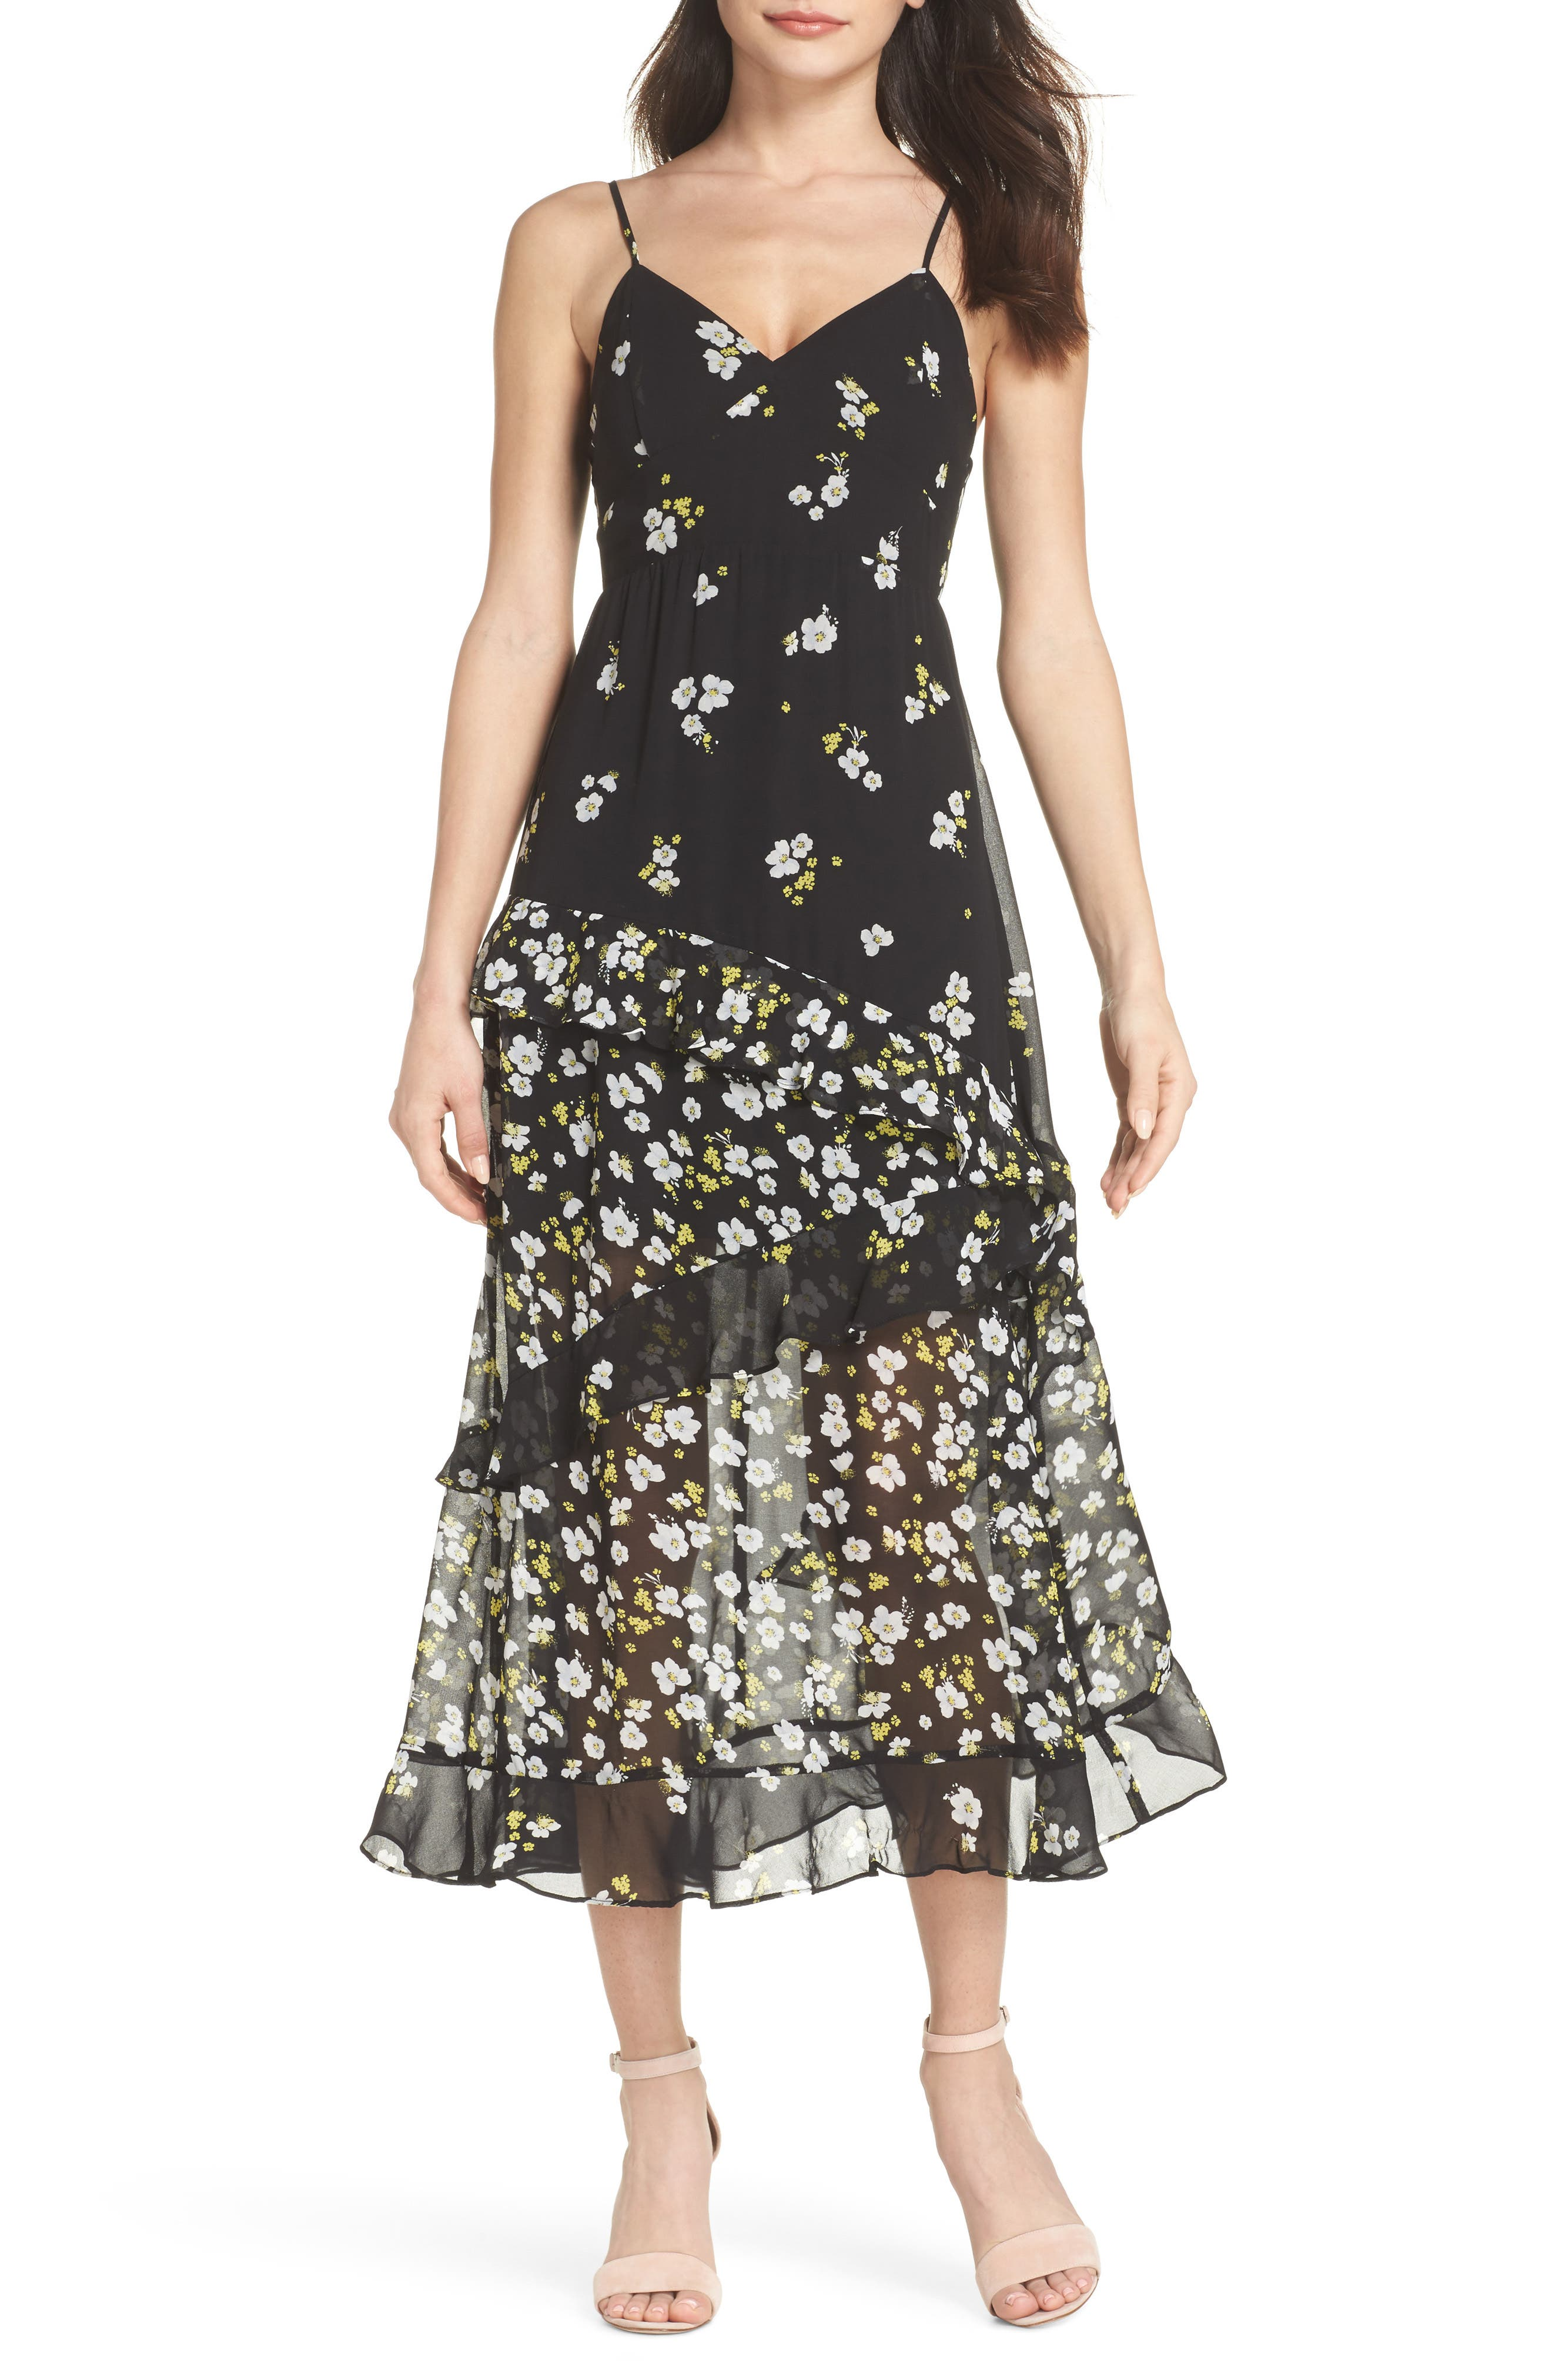 Bardot Ditzy Floral & Ruffle Chiffon Dress